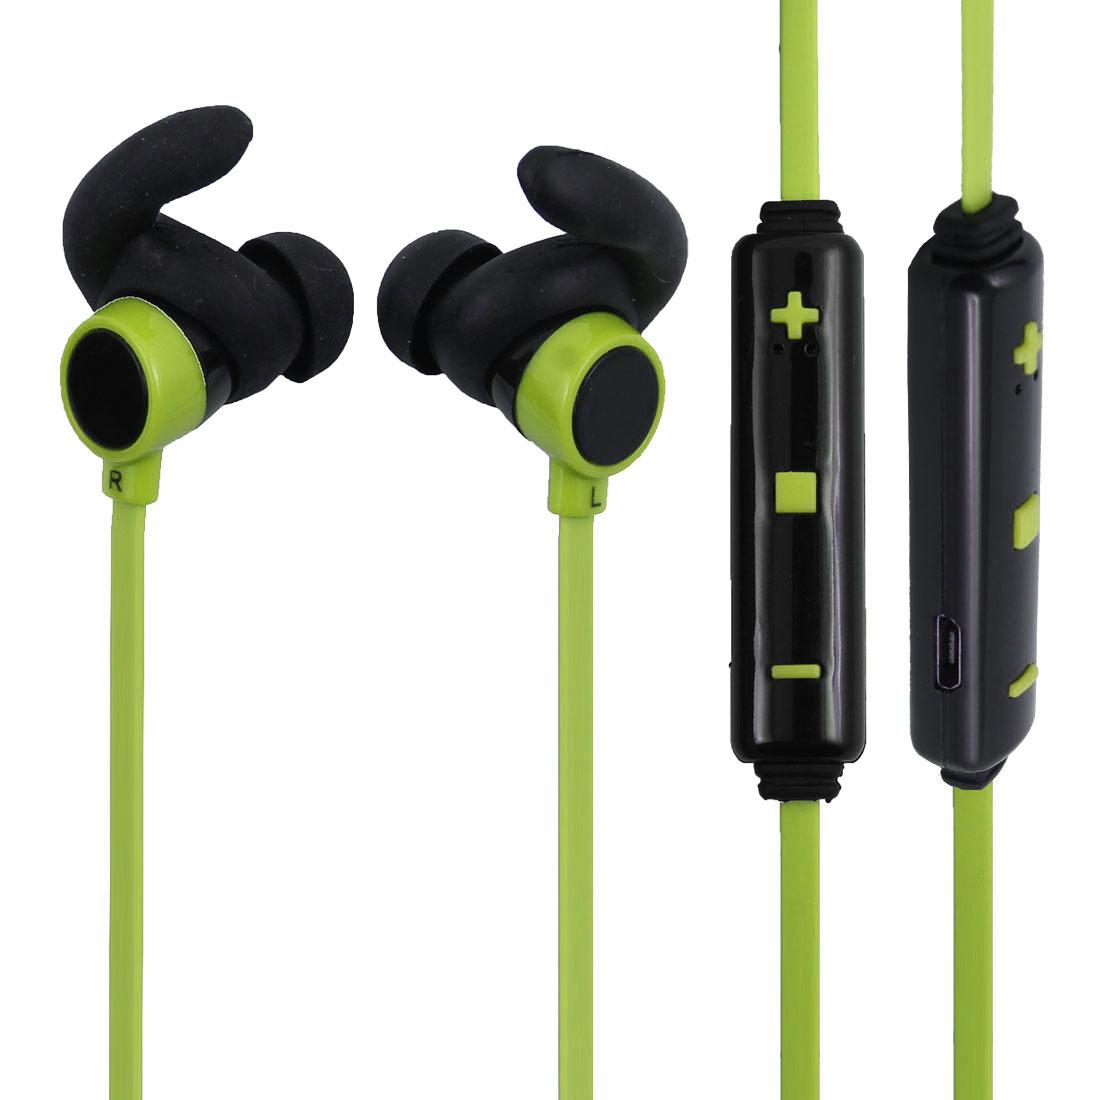 bluetooth 4.1 Wireless Headphone In-ear Earbuds Mic Yellow Green for Sport